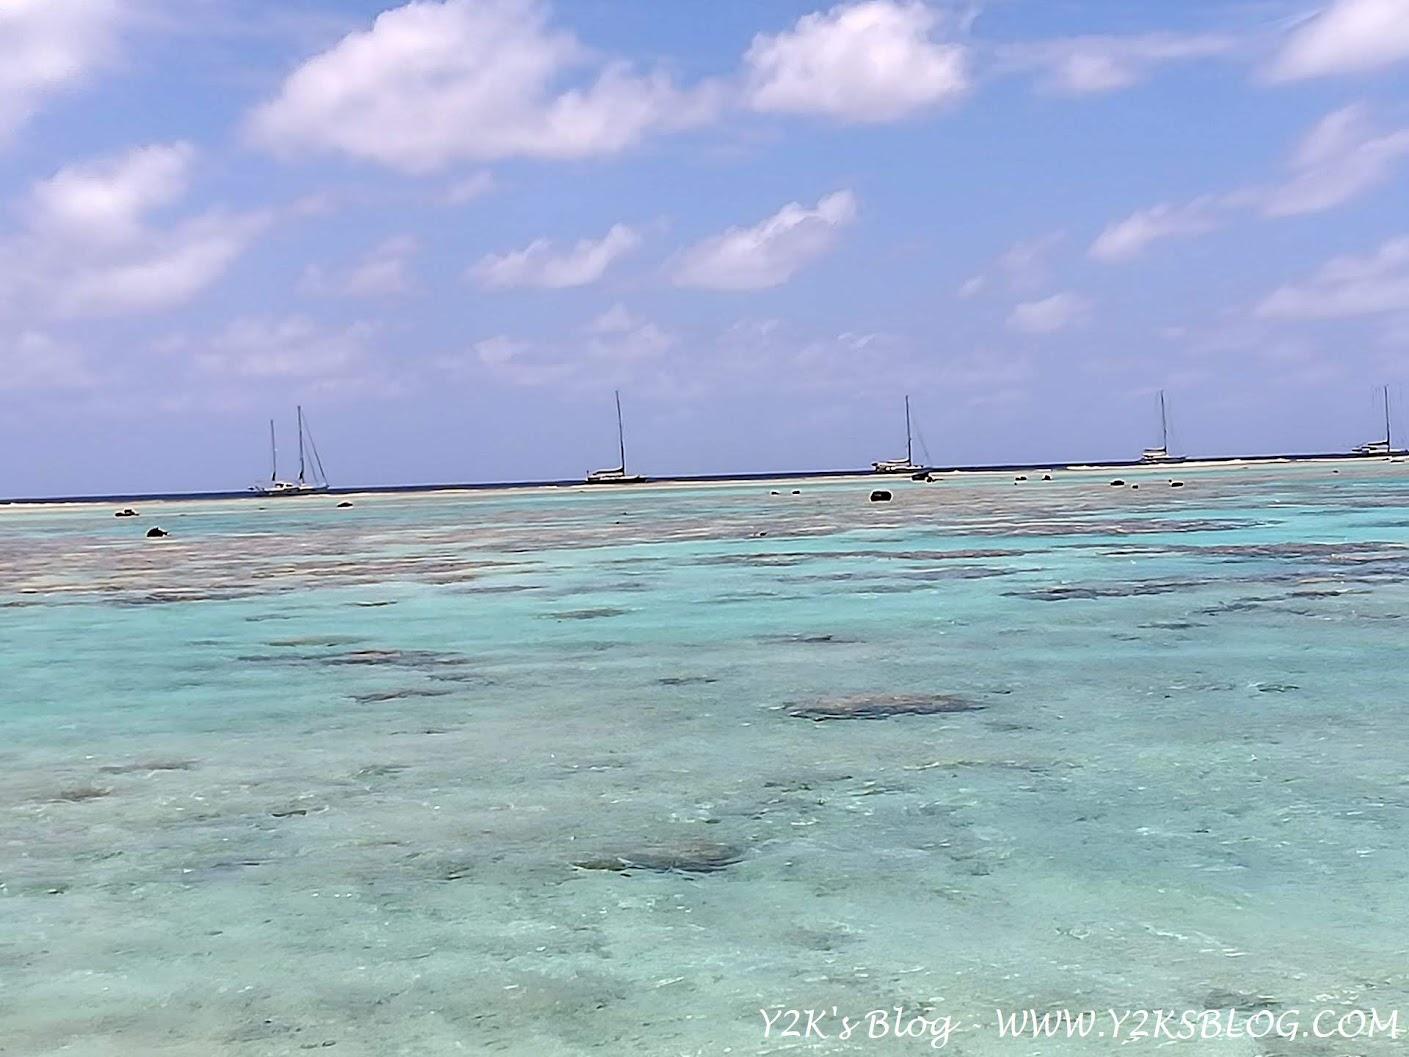 Le barche all'esterno del reef. Da SX: Little Fish, Cinnabar, Y2K, Smetana, Obiwan